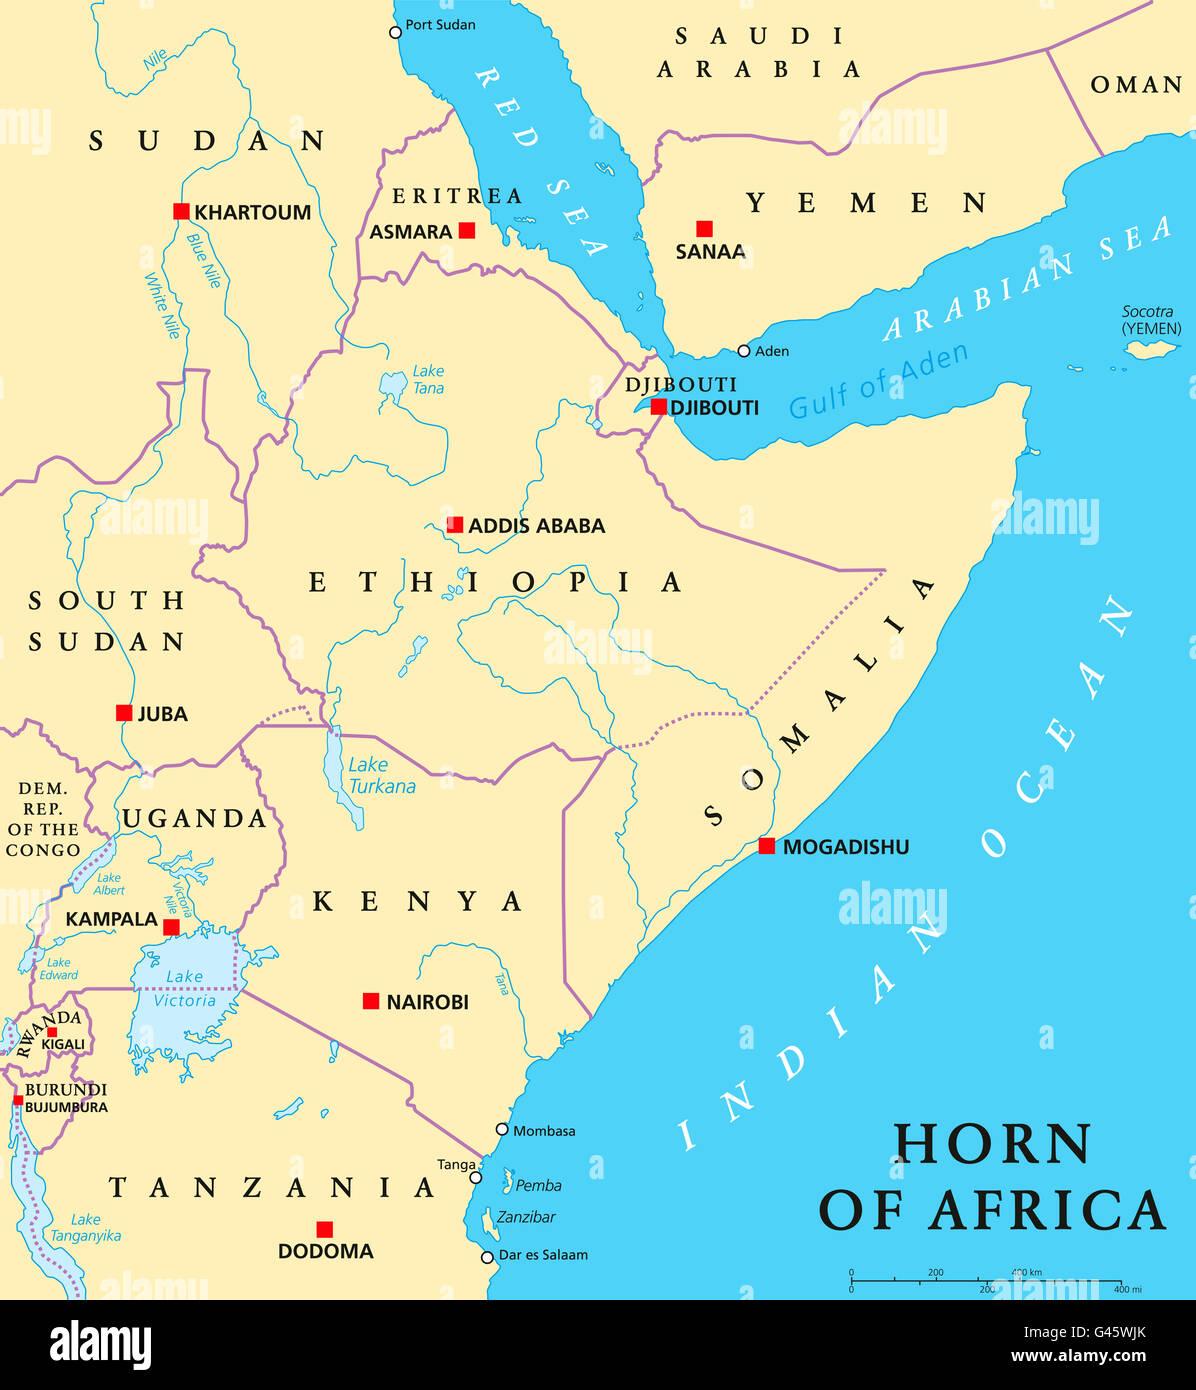 Kenya Political Map Capital Nairobi Stock Photos Kenya Political - Kenya rivers map